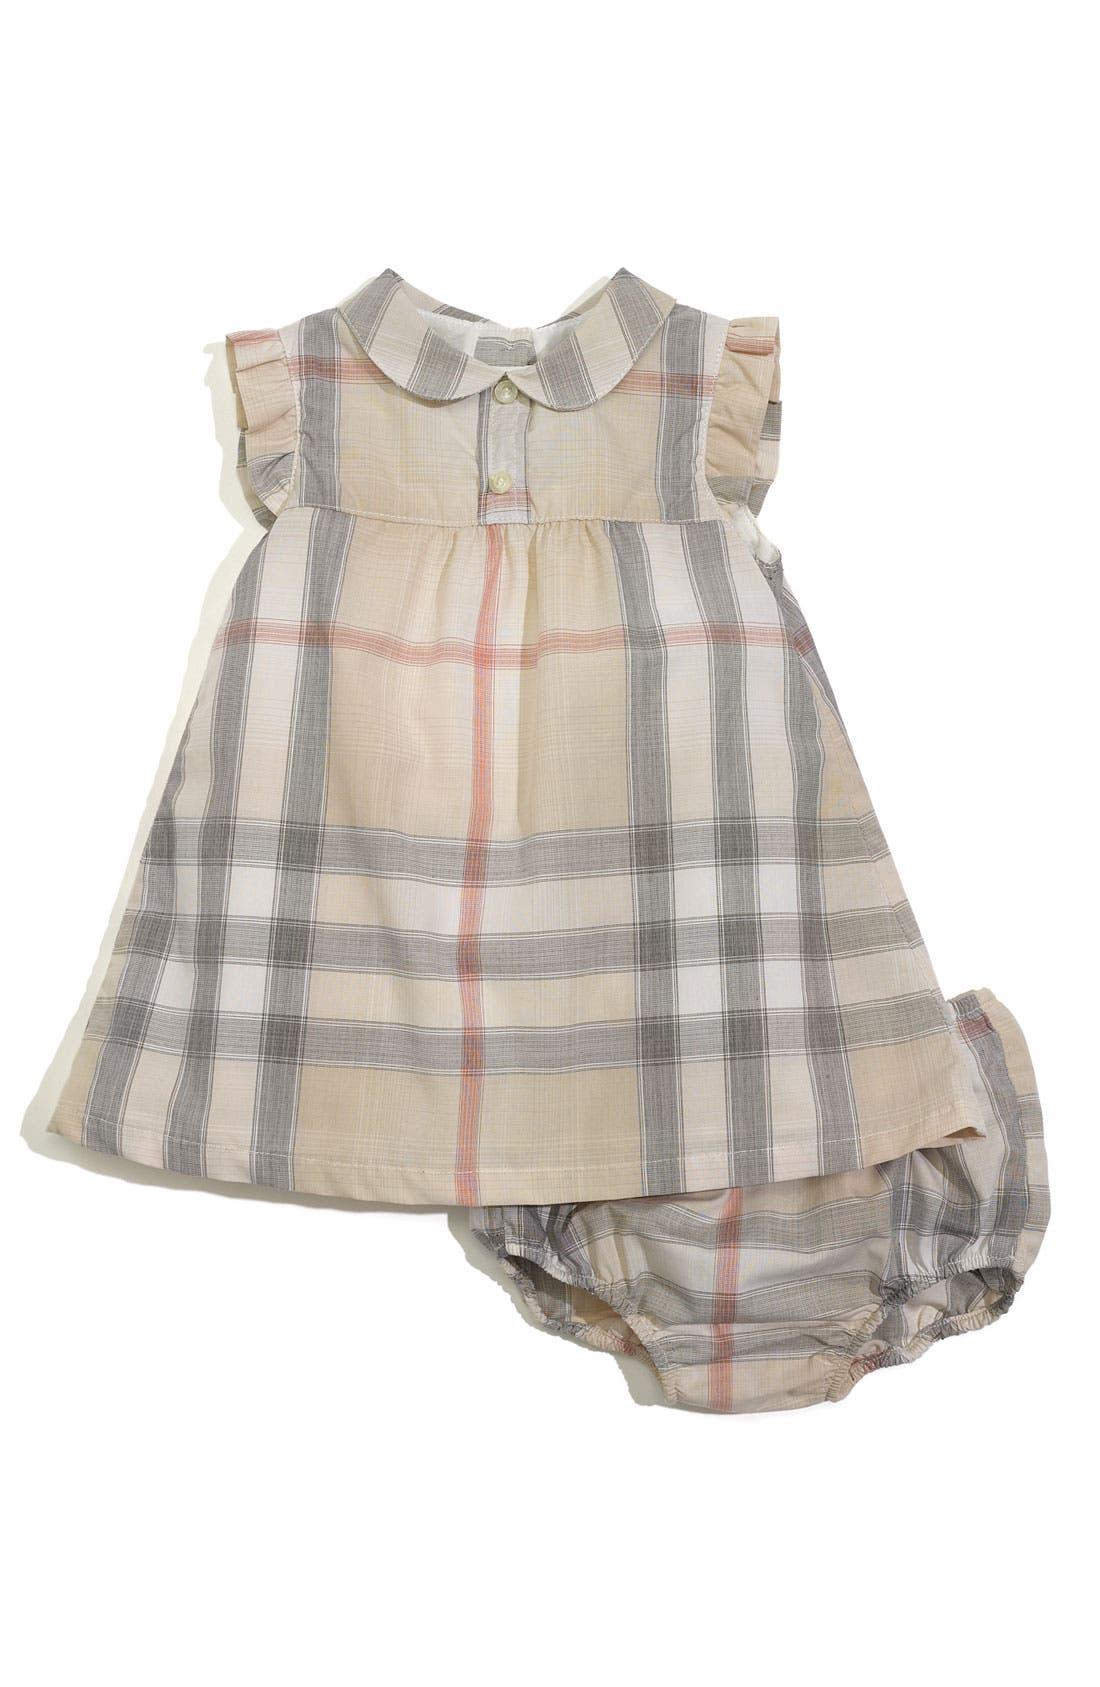 Main Image - Burberry Sleeveless Dress & Diaper Cover (Infant)